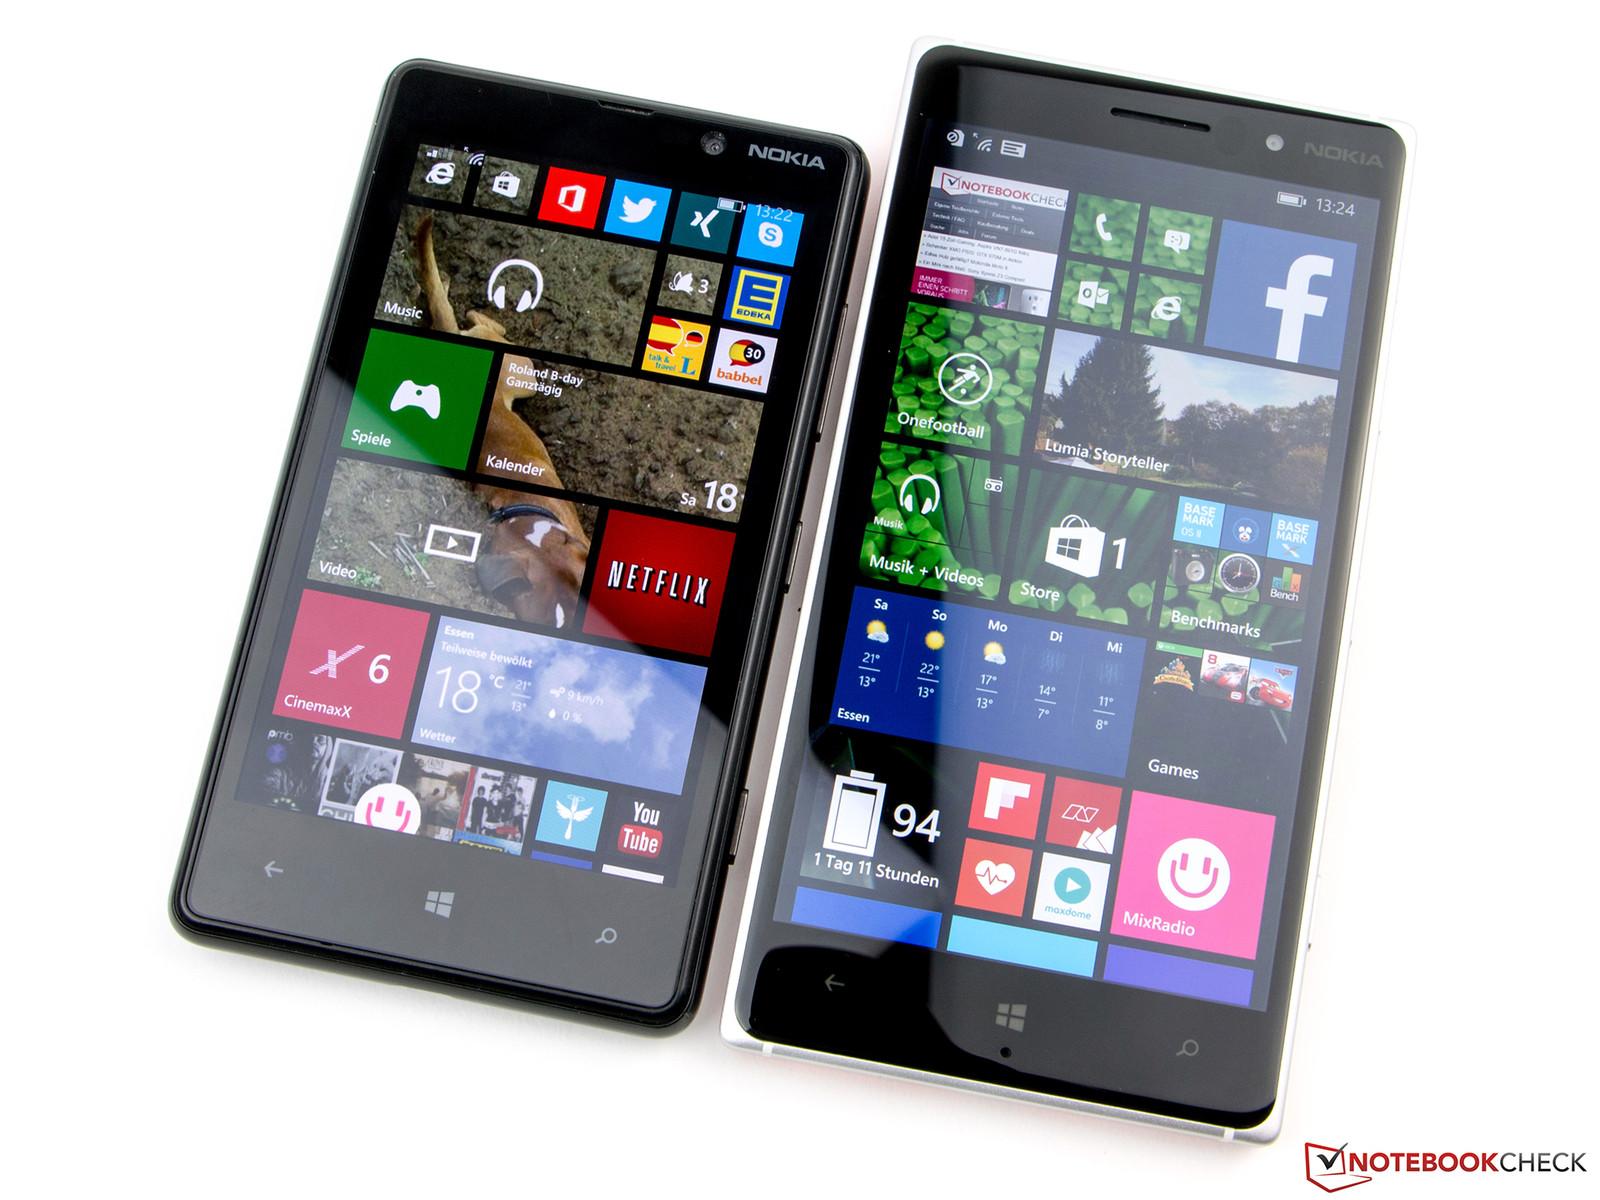 Nokia lumia 830 reviews - The Screen Size Has Also Increased Greatly The Aluminum Bezel Of Nokia S Lumia 830